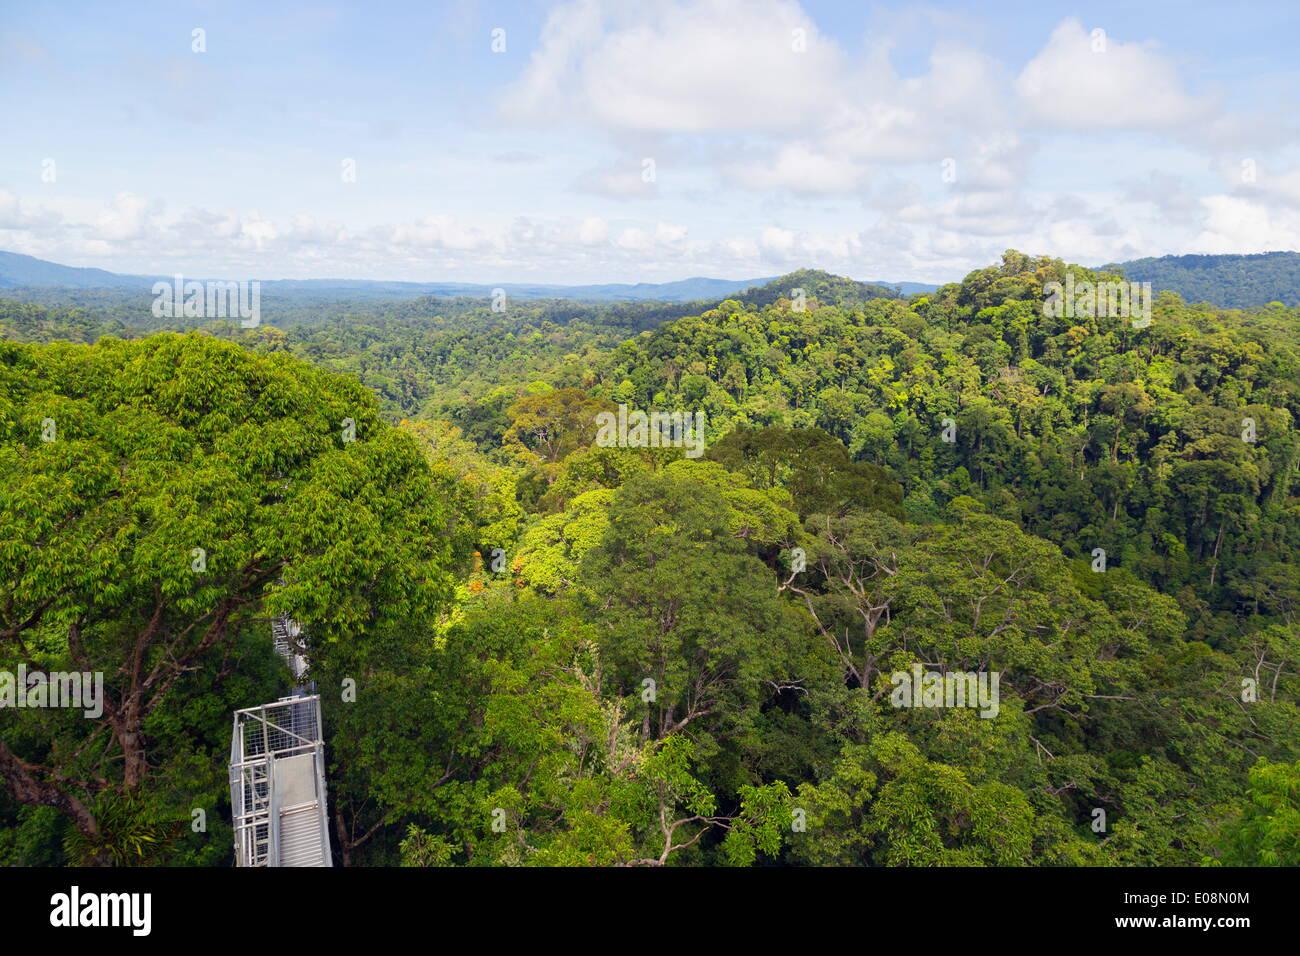 Canopy walk, Ula Temburong National Park, Brunei, Borneo, Southeast Asia, Asia - Stock Image